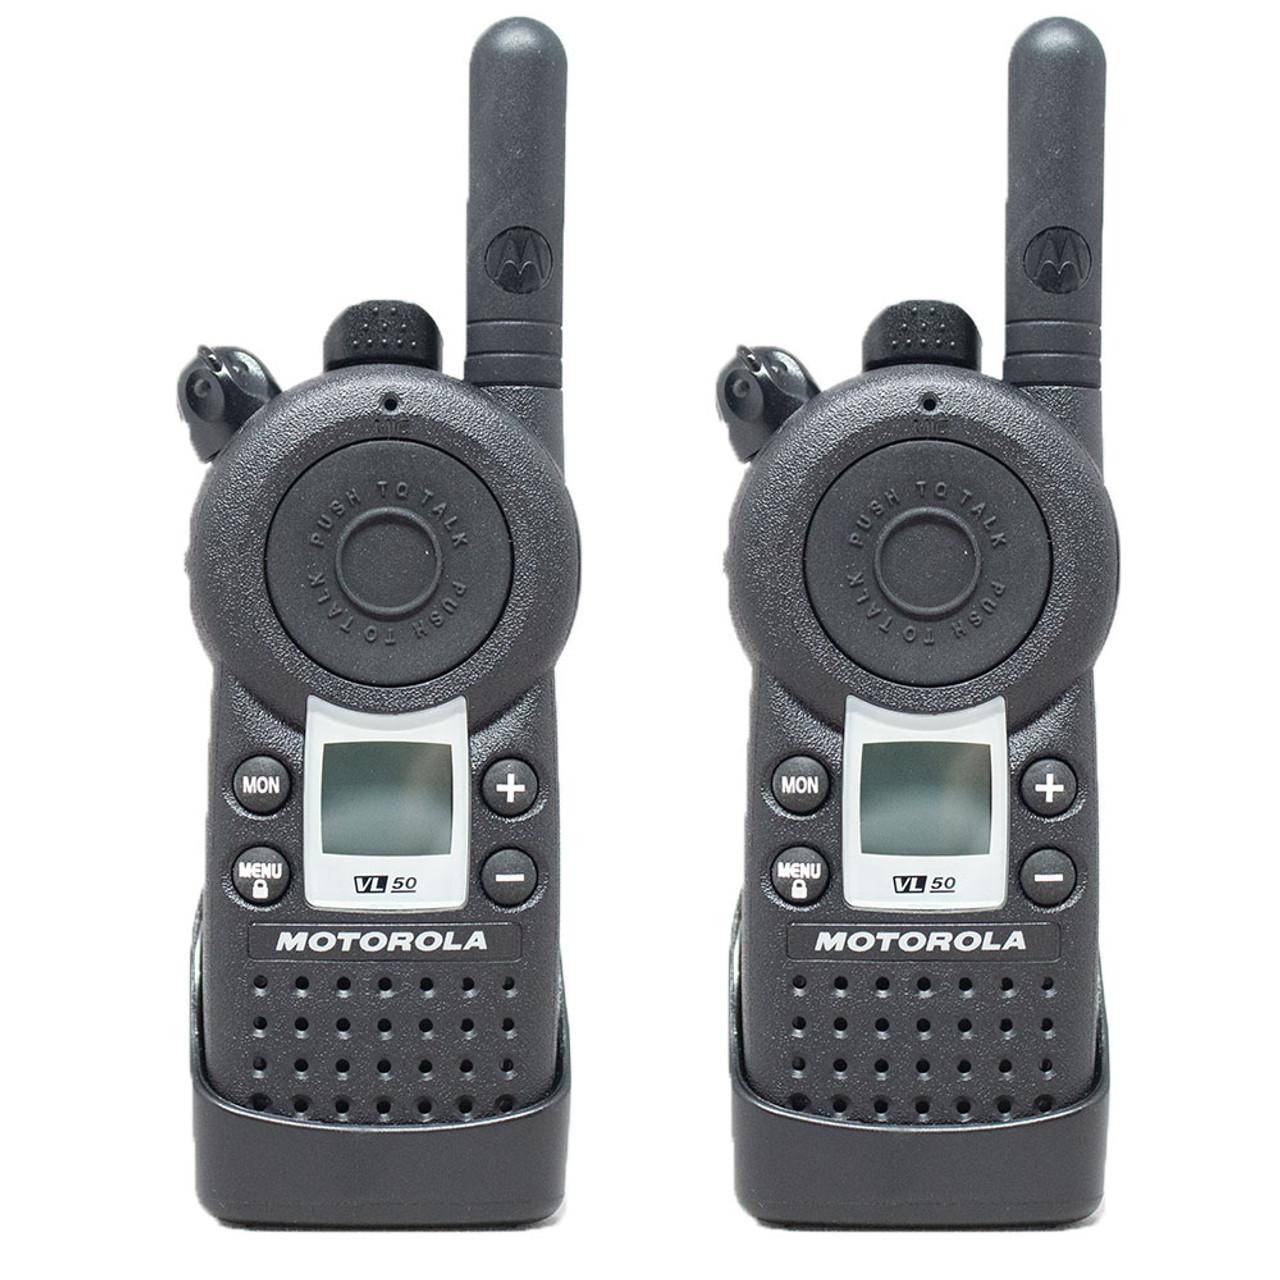 Motorola VL50 1 Watt 8 Channel UHF Two Way Radio, Pack of 2